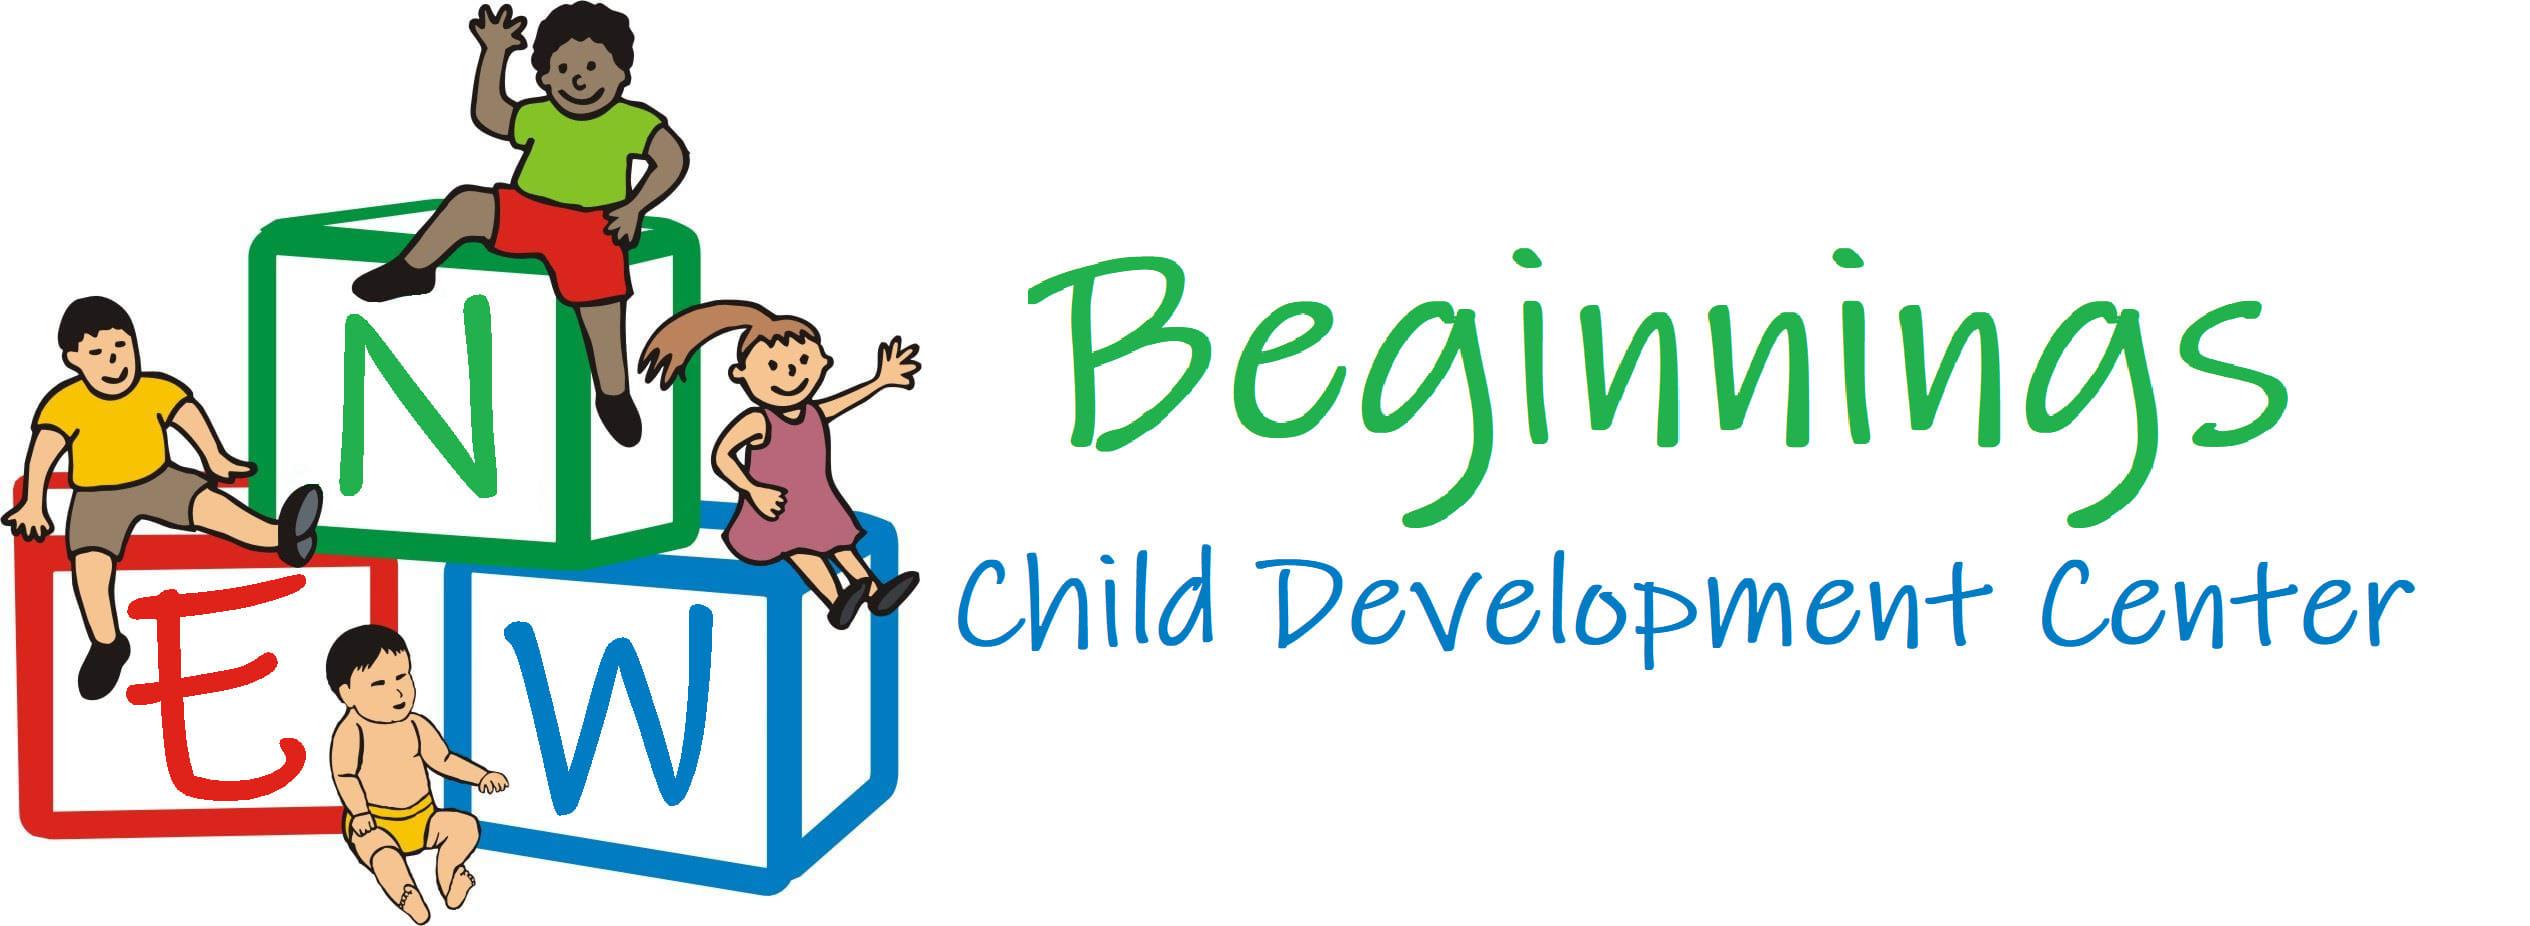 New Beginnings Child Development Center